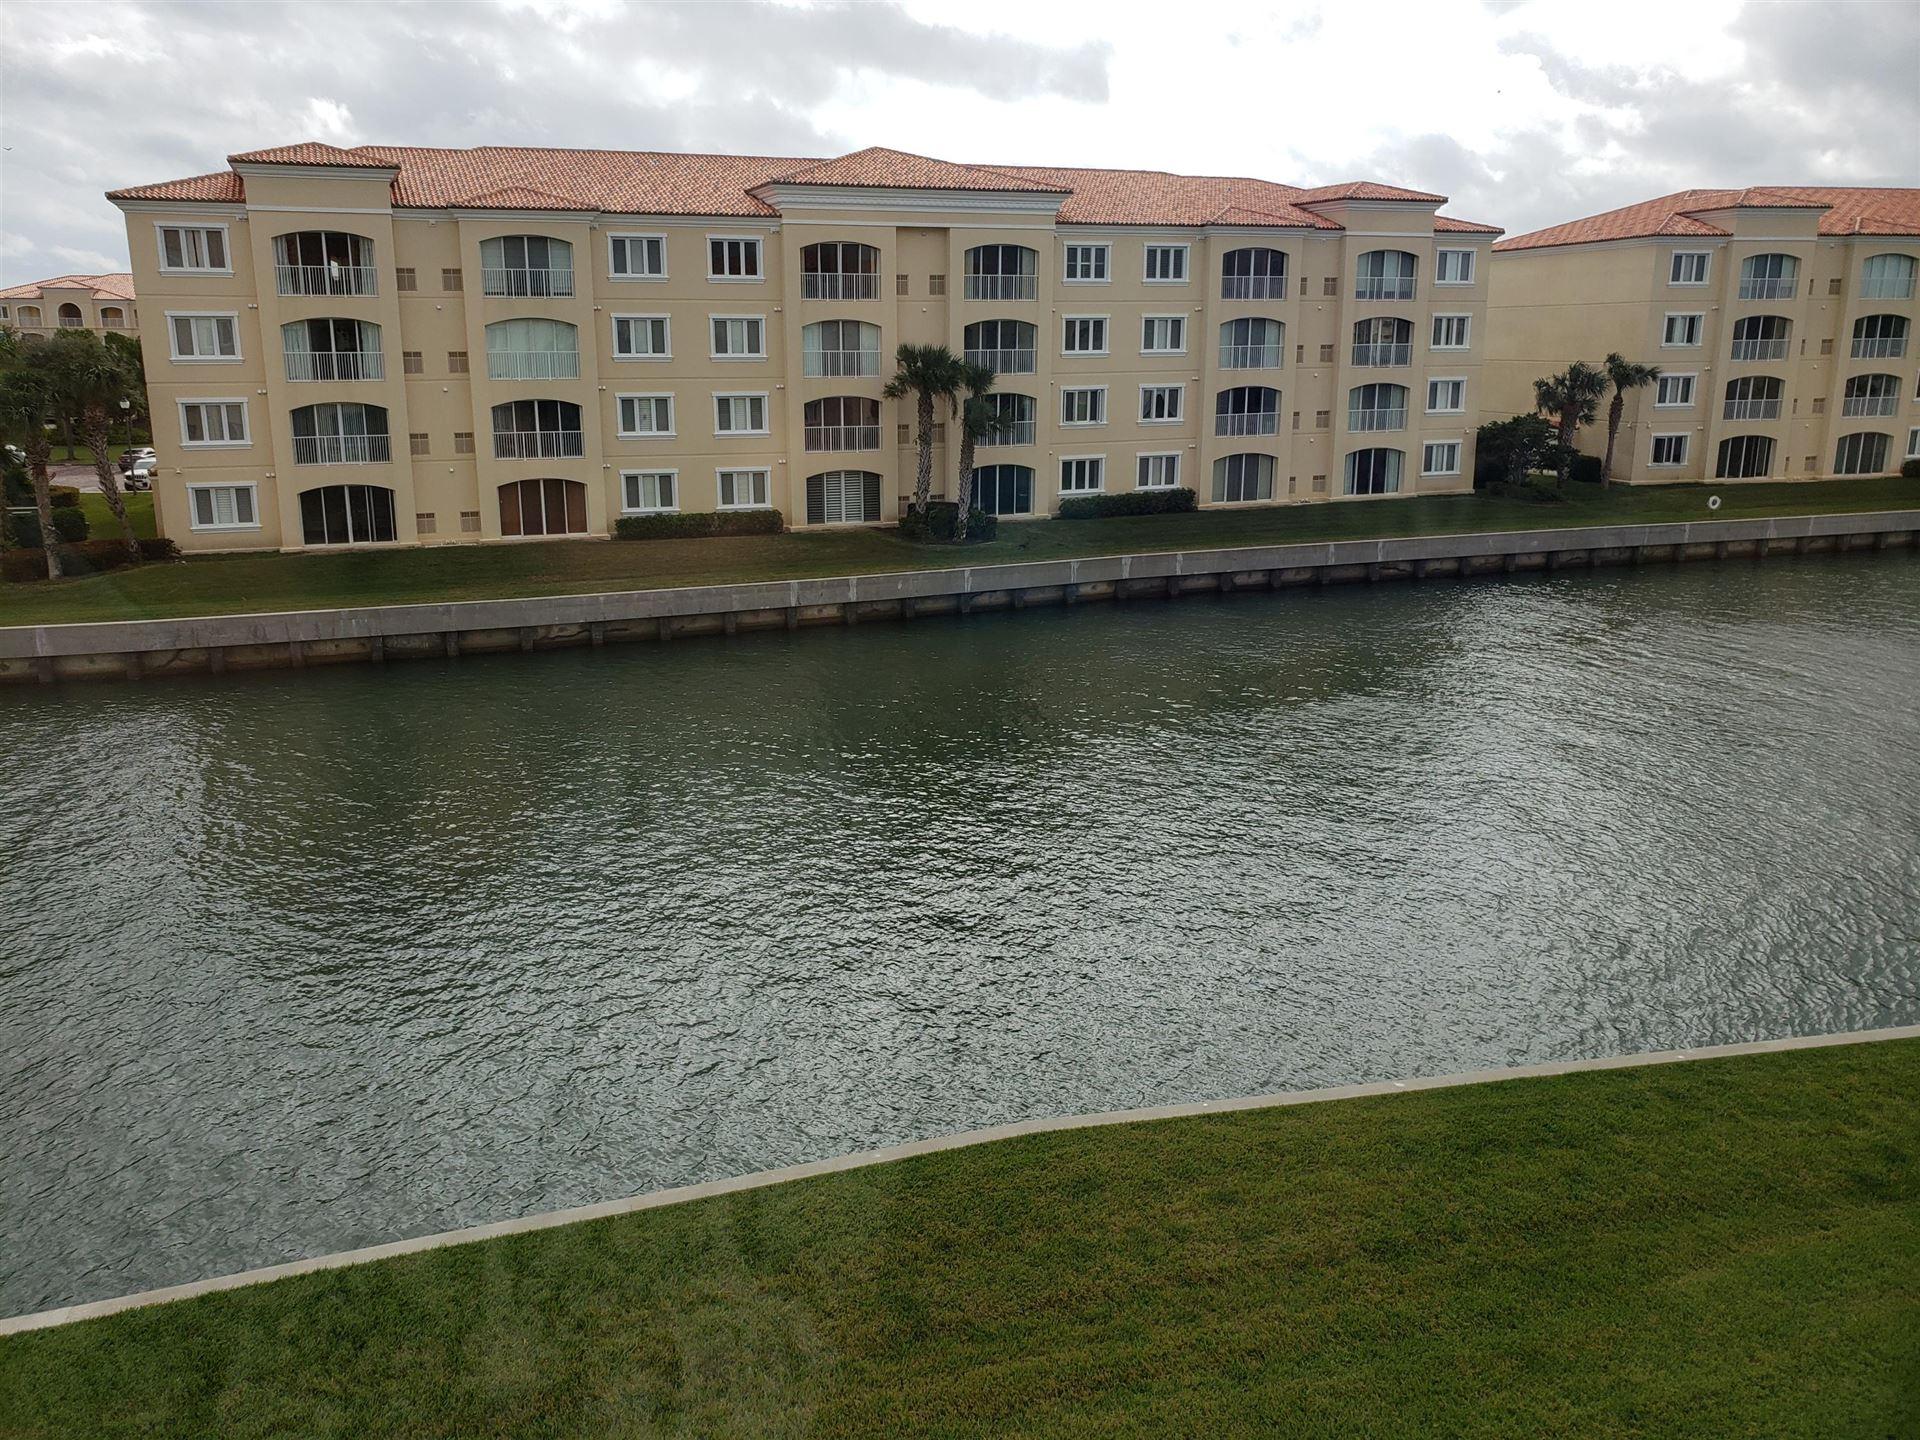 Photo of 7 Harbour Isle Drive E #305, Fort Pierce, FL 34949 (MLS # RX-10698011)